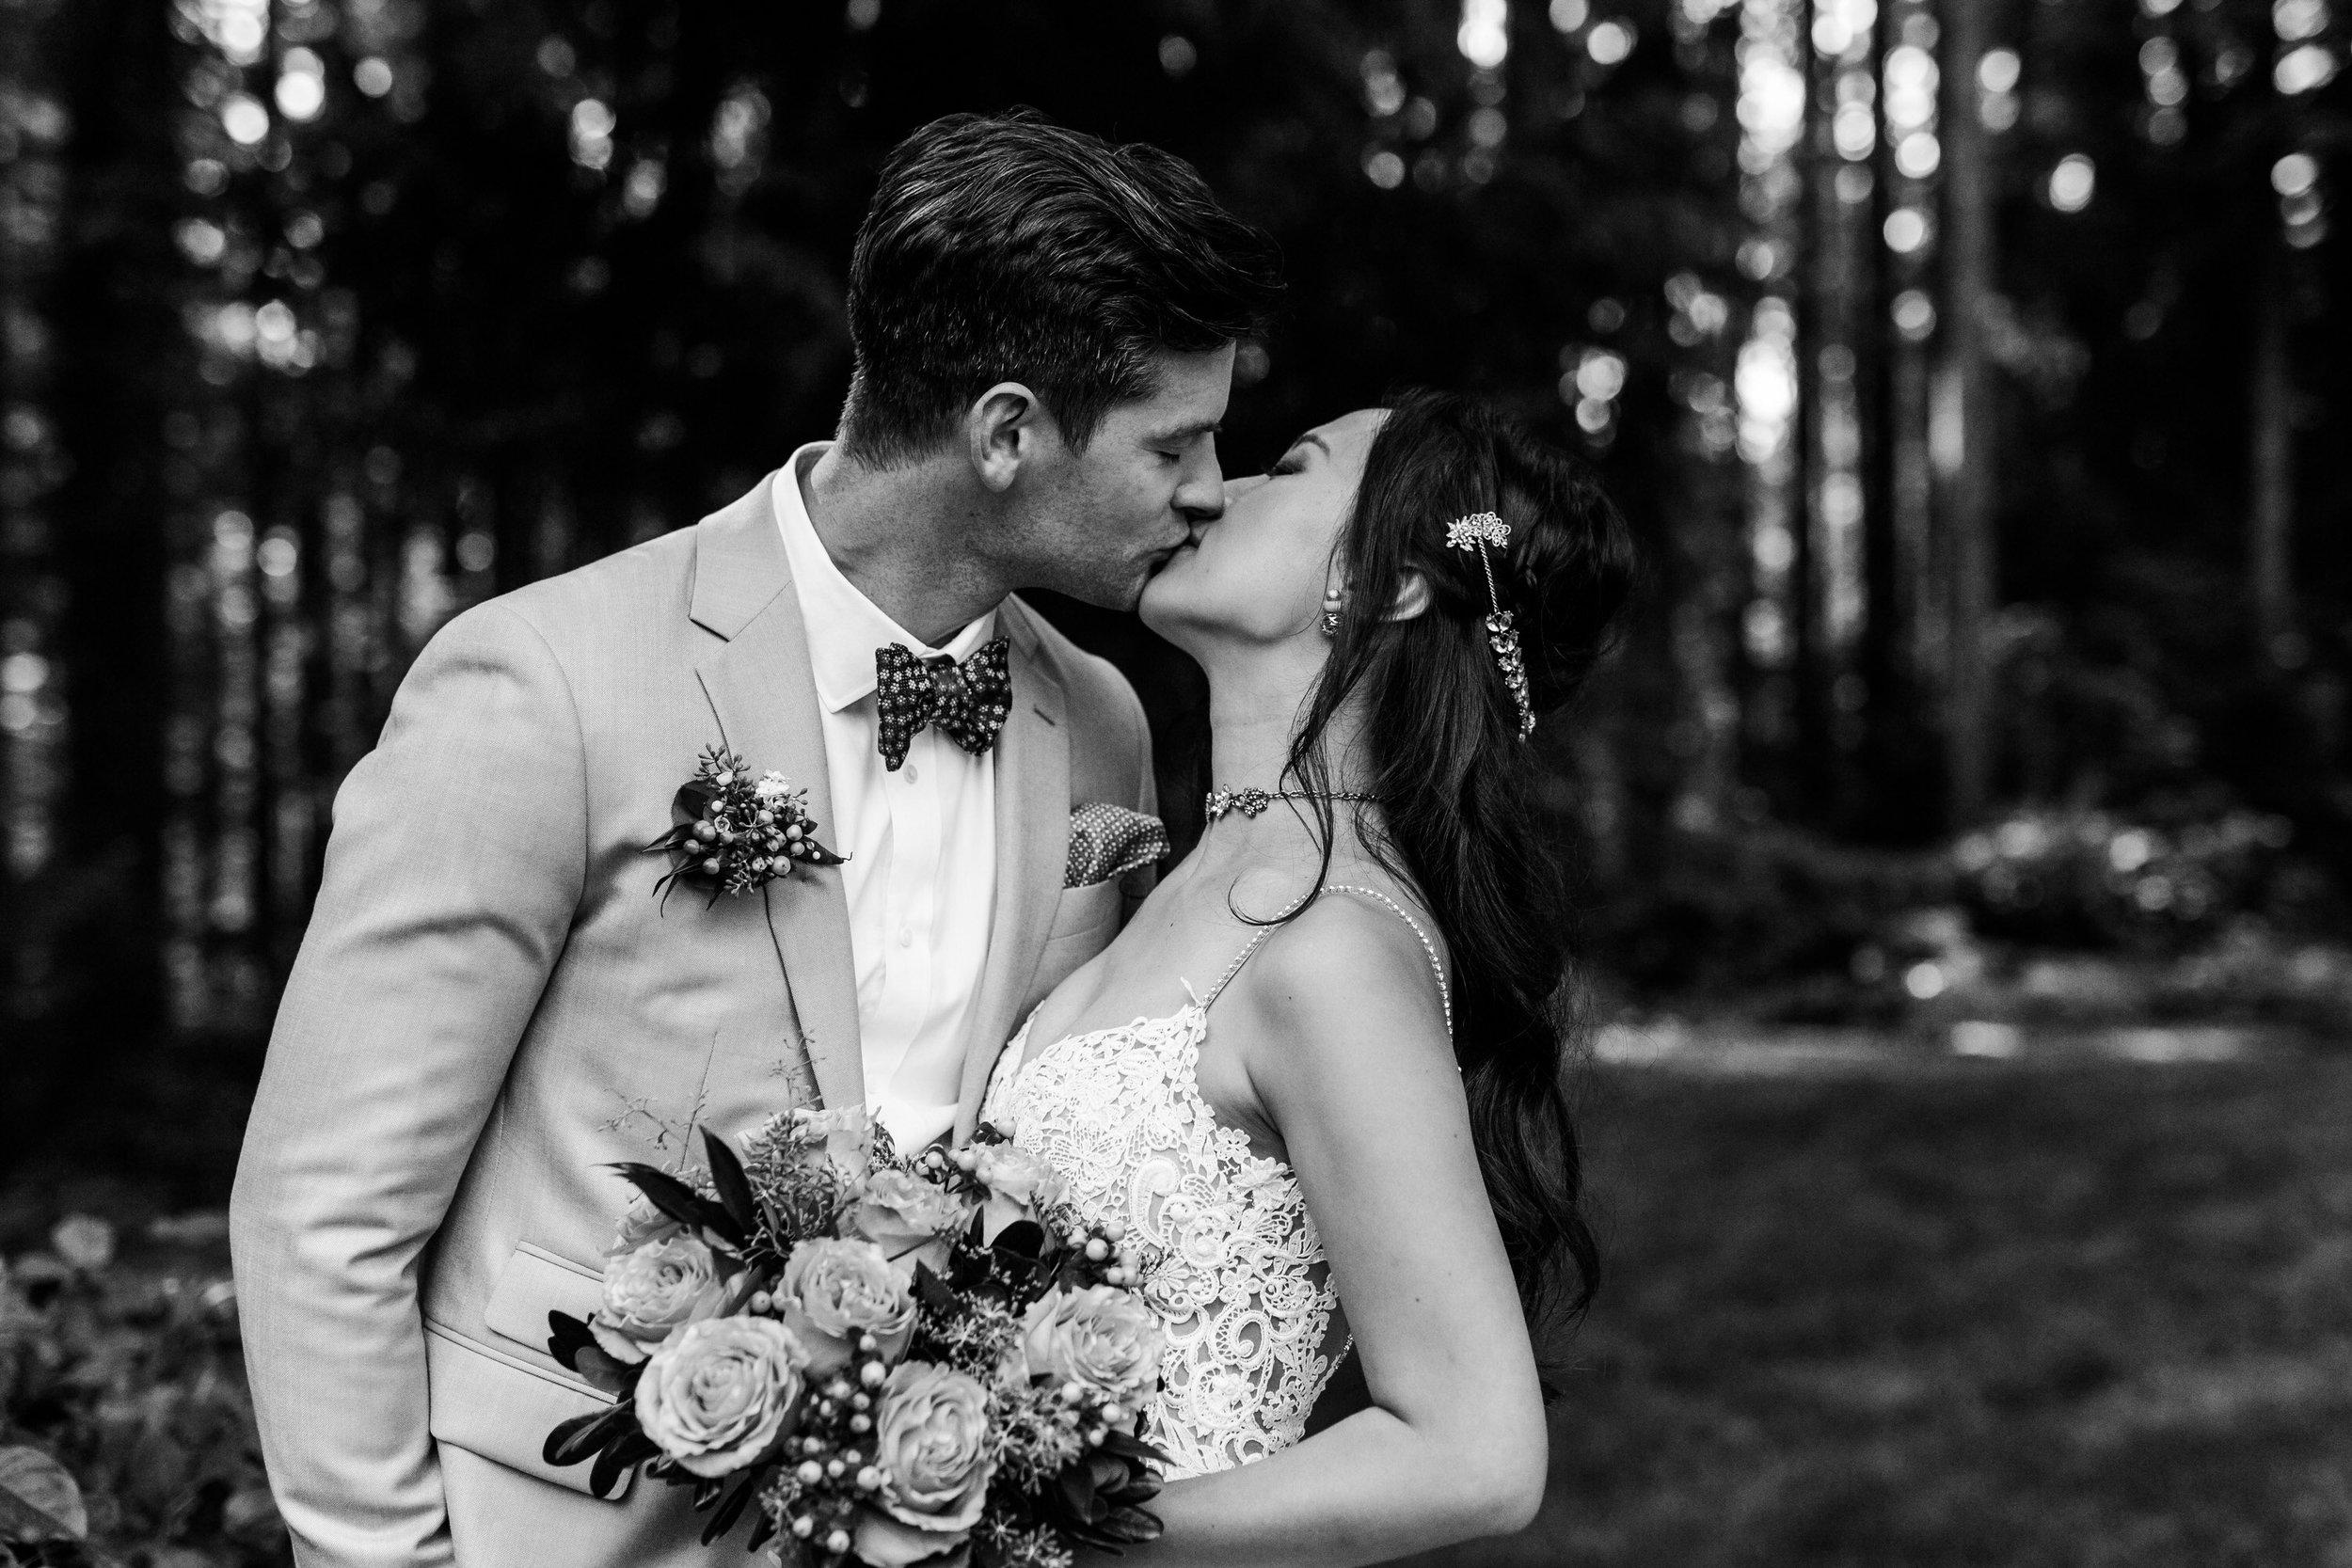 Linwood House Wedding Photos - Roberts Creek Wedding Photos - Vancouver Wedding Photographer & Videographer - Sunshine Coast Wedding Photos - Sunshine Coast Wedding Photographer - Jennifer Picard Photography - IMG_7768.jpg